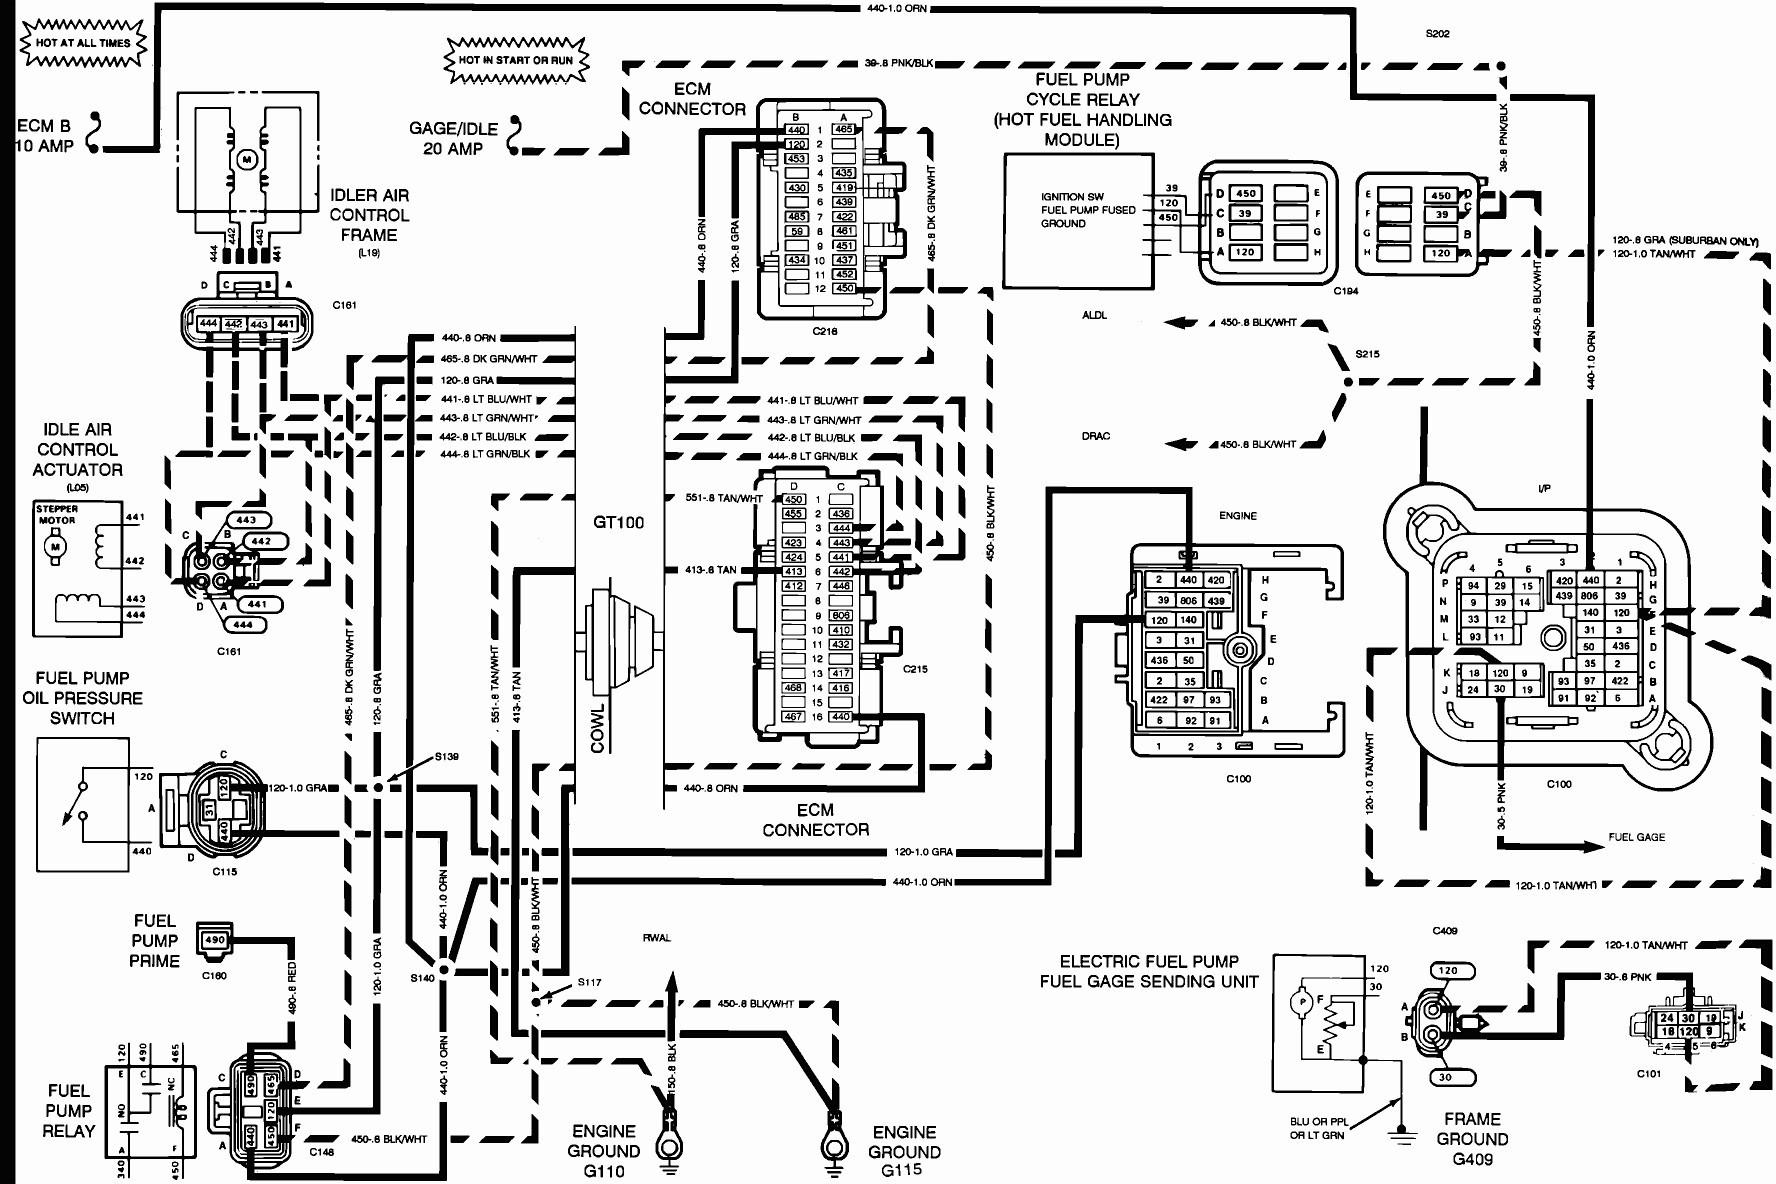 Discovery Fleetwood Rv Wiring Diagram Dash